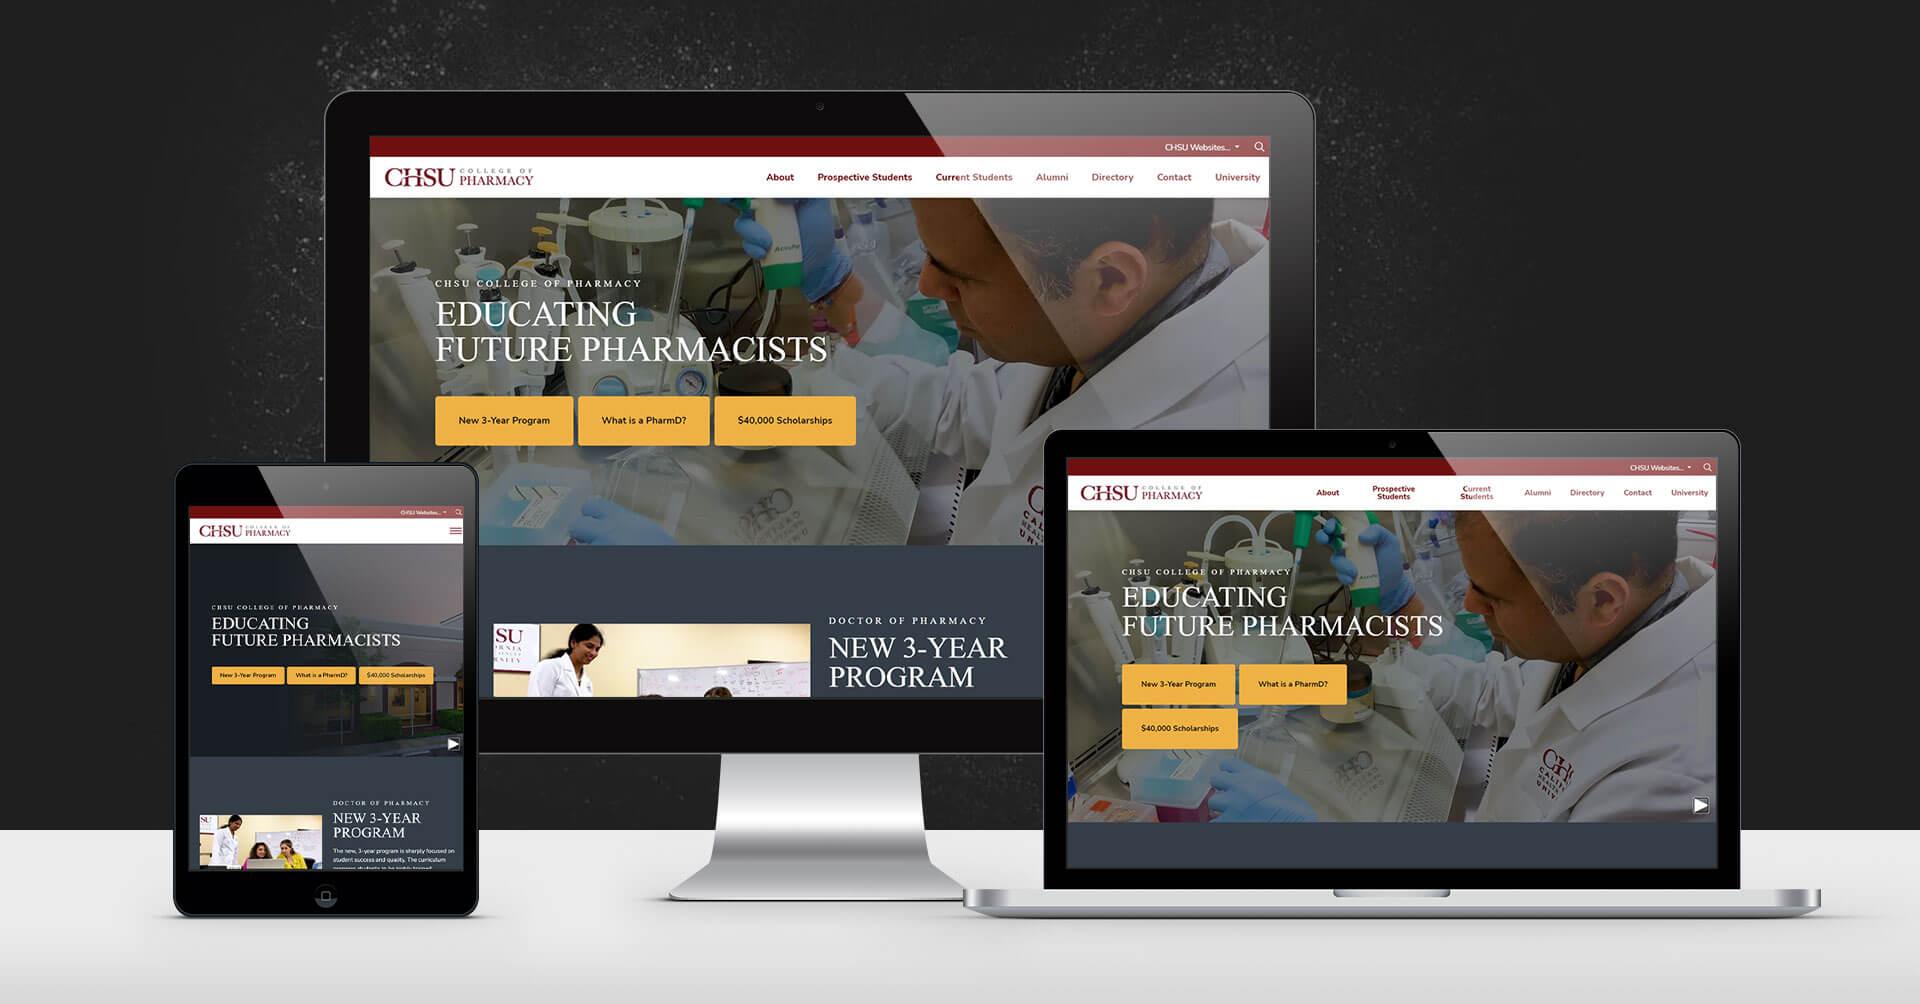 portfolio digital attic chsu college of pharmacy device images